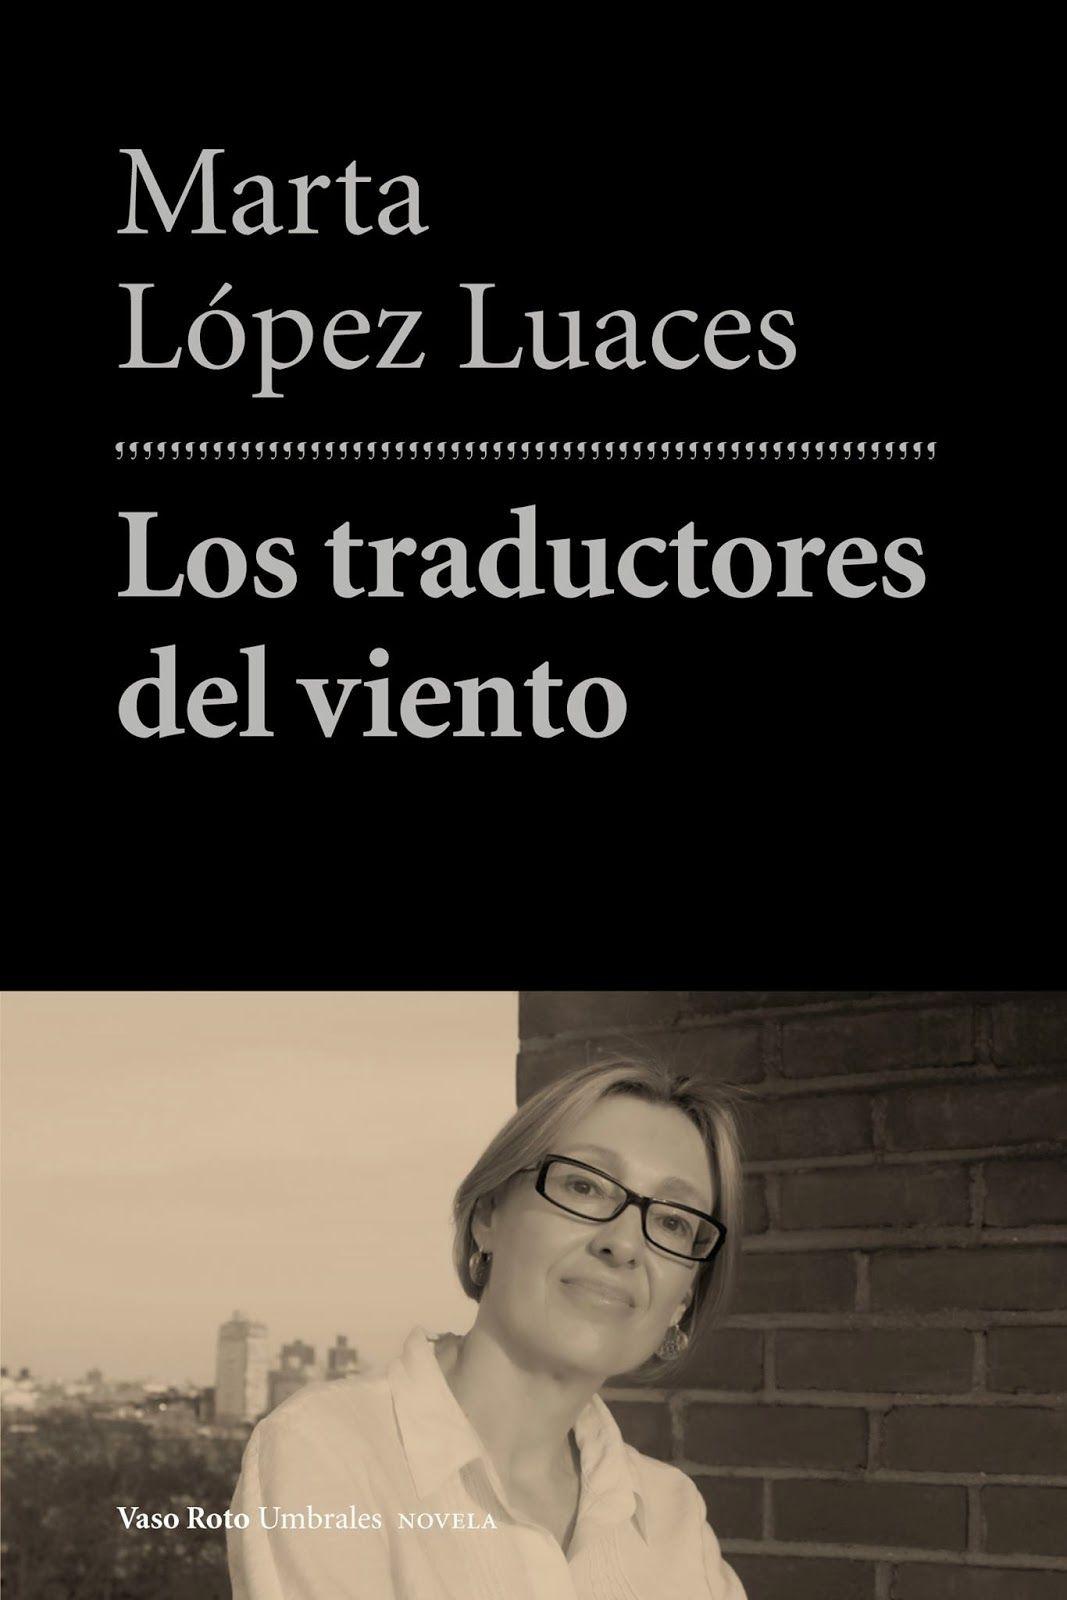 Nueva imagenMarta Lopez Luaces